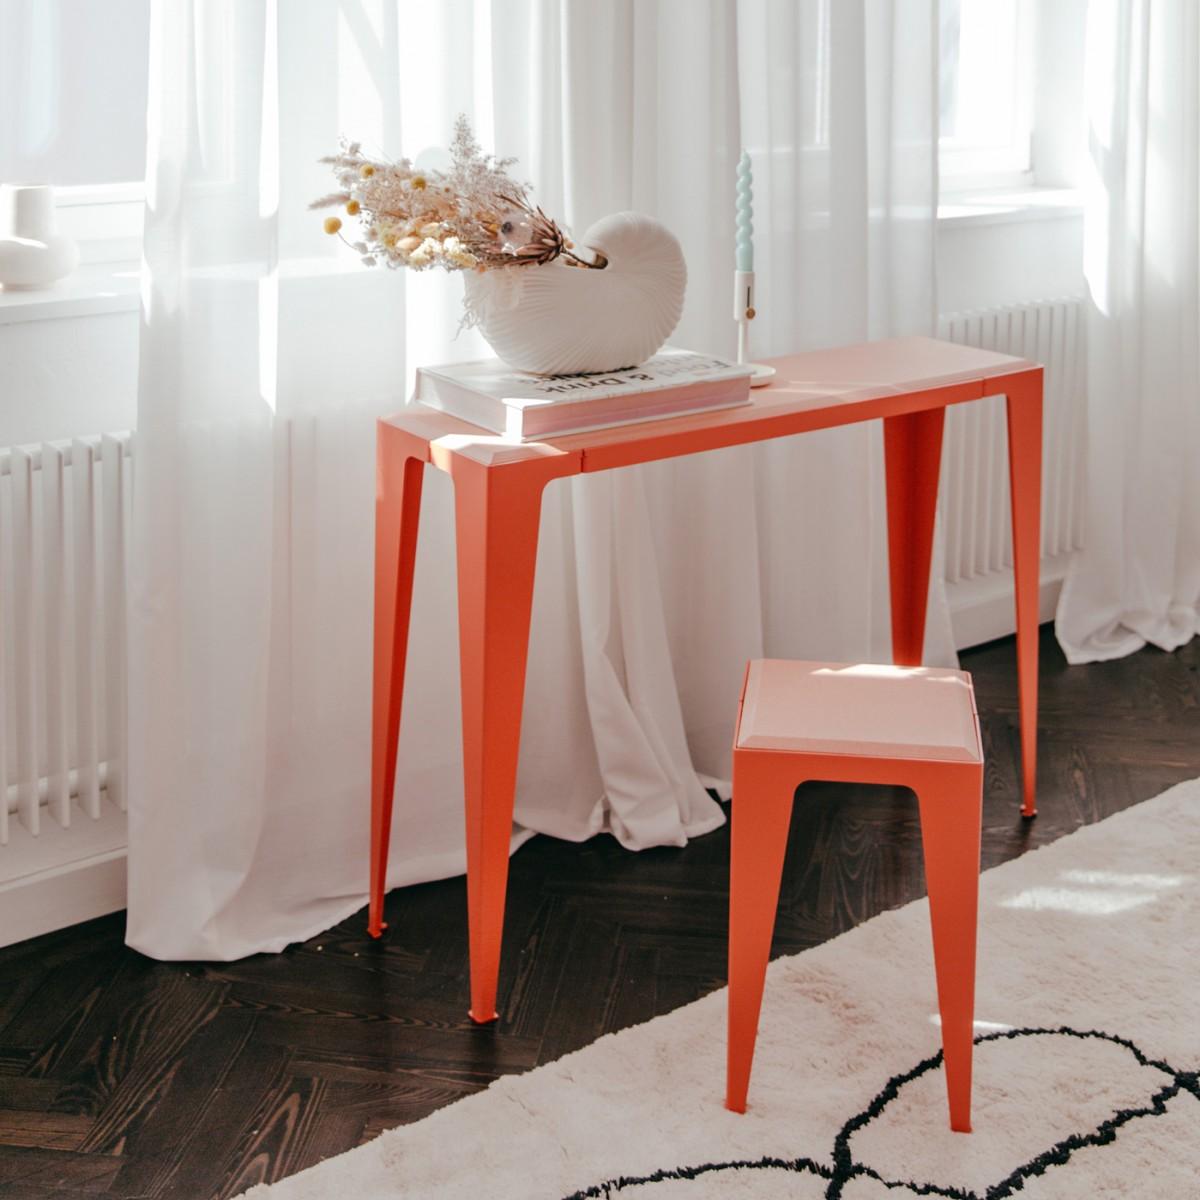 KONSOLE |CHAMFER| Kalypso-Rot *EXKLUSIVE KOLLEKTION* | nachhaltiges Möbeldesign | WYE